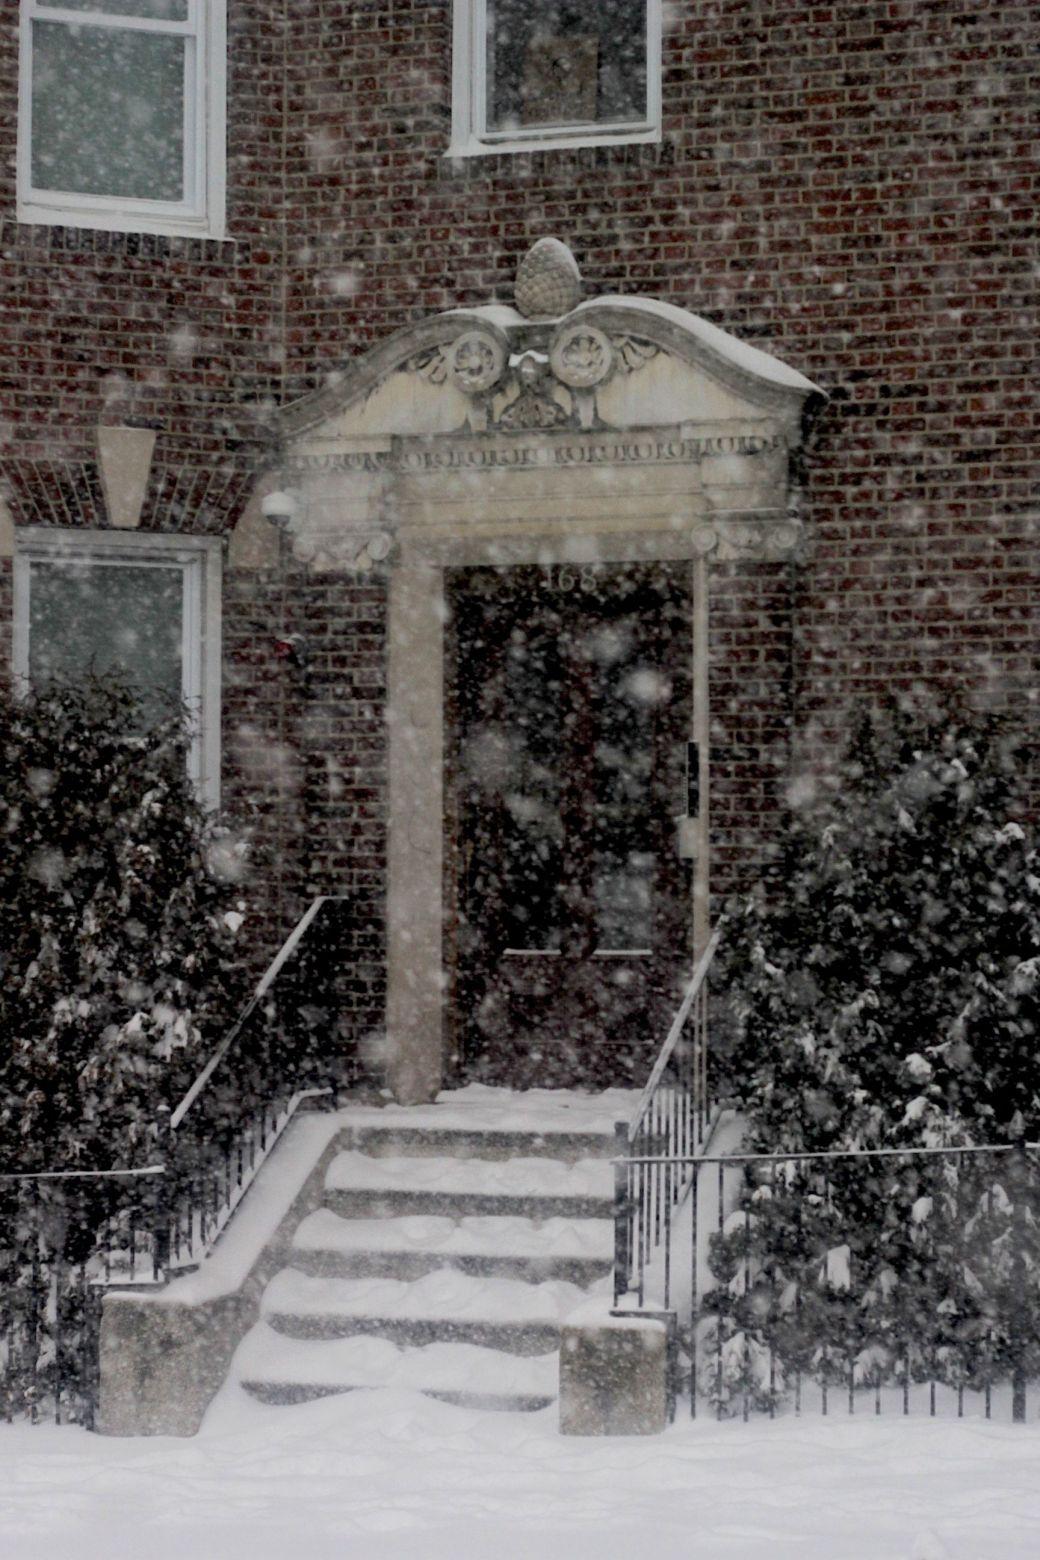 boston-snow-storm-february-9-2017-2